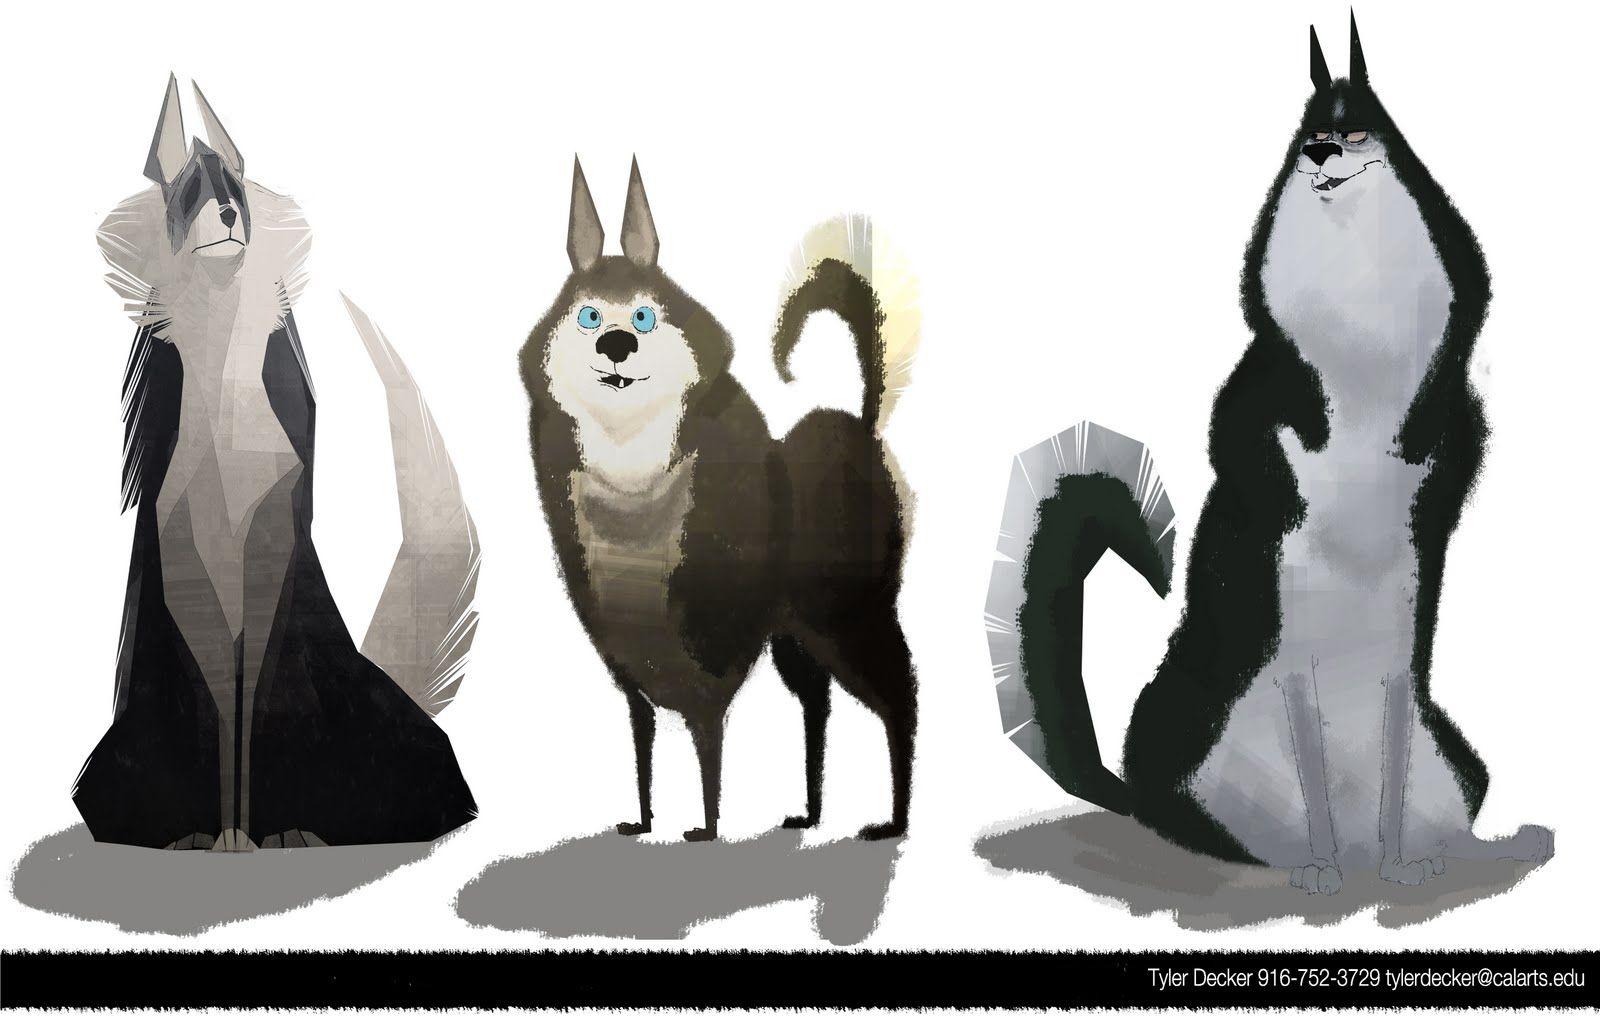 Animation Character Design Portfolio : Tyler decker portfolio character design visual